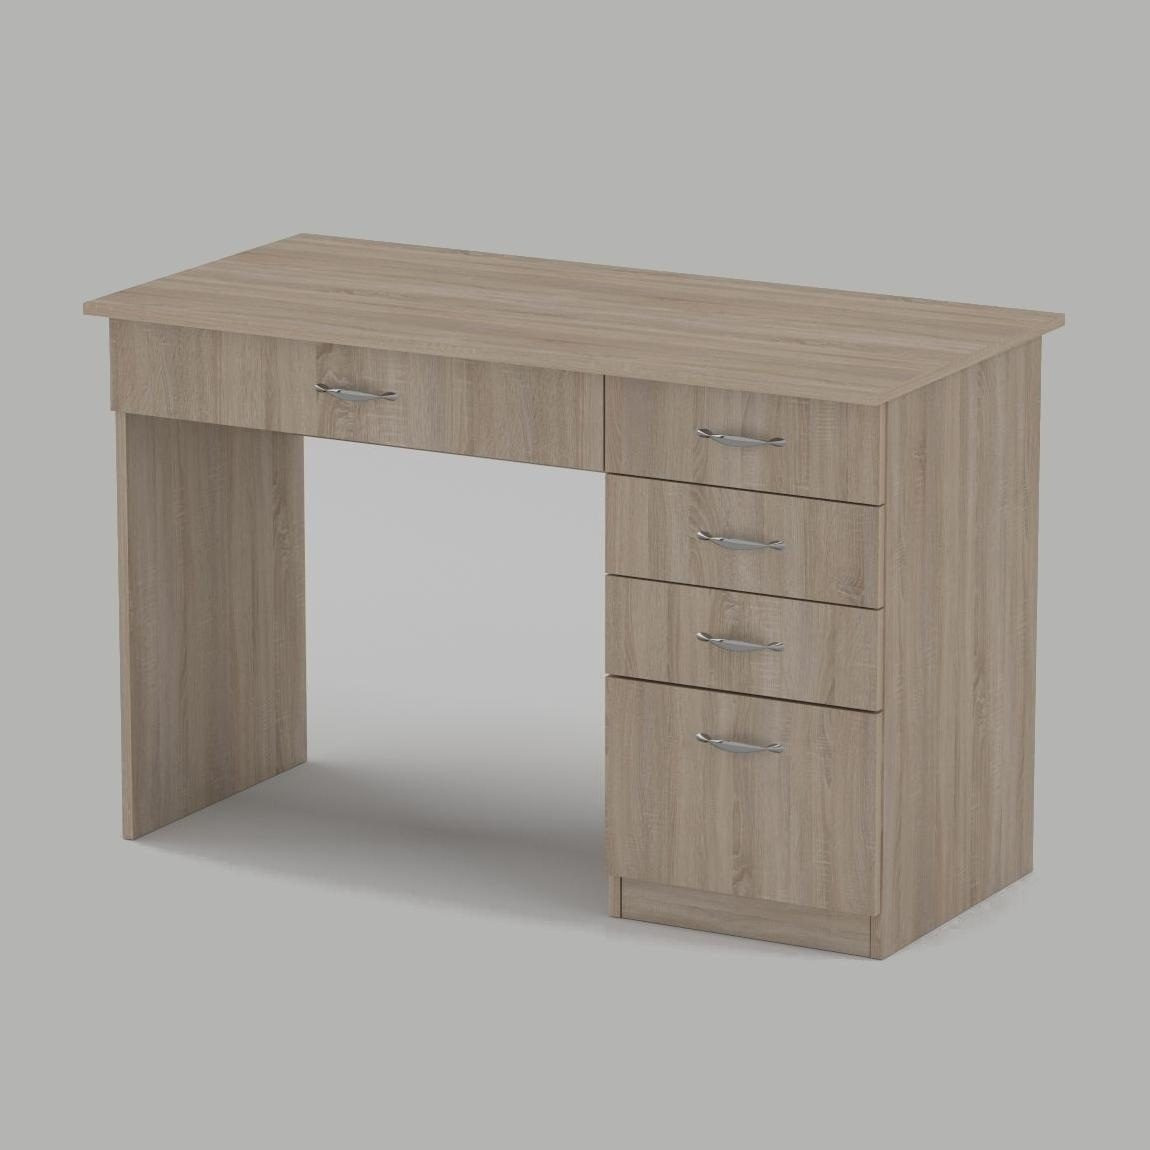 Письменный стол Компанит Студент 1155х550х736 мм дуб сонома